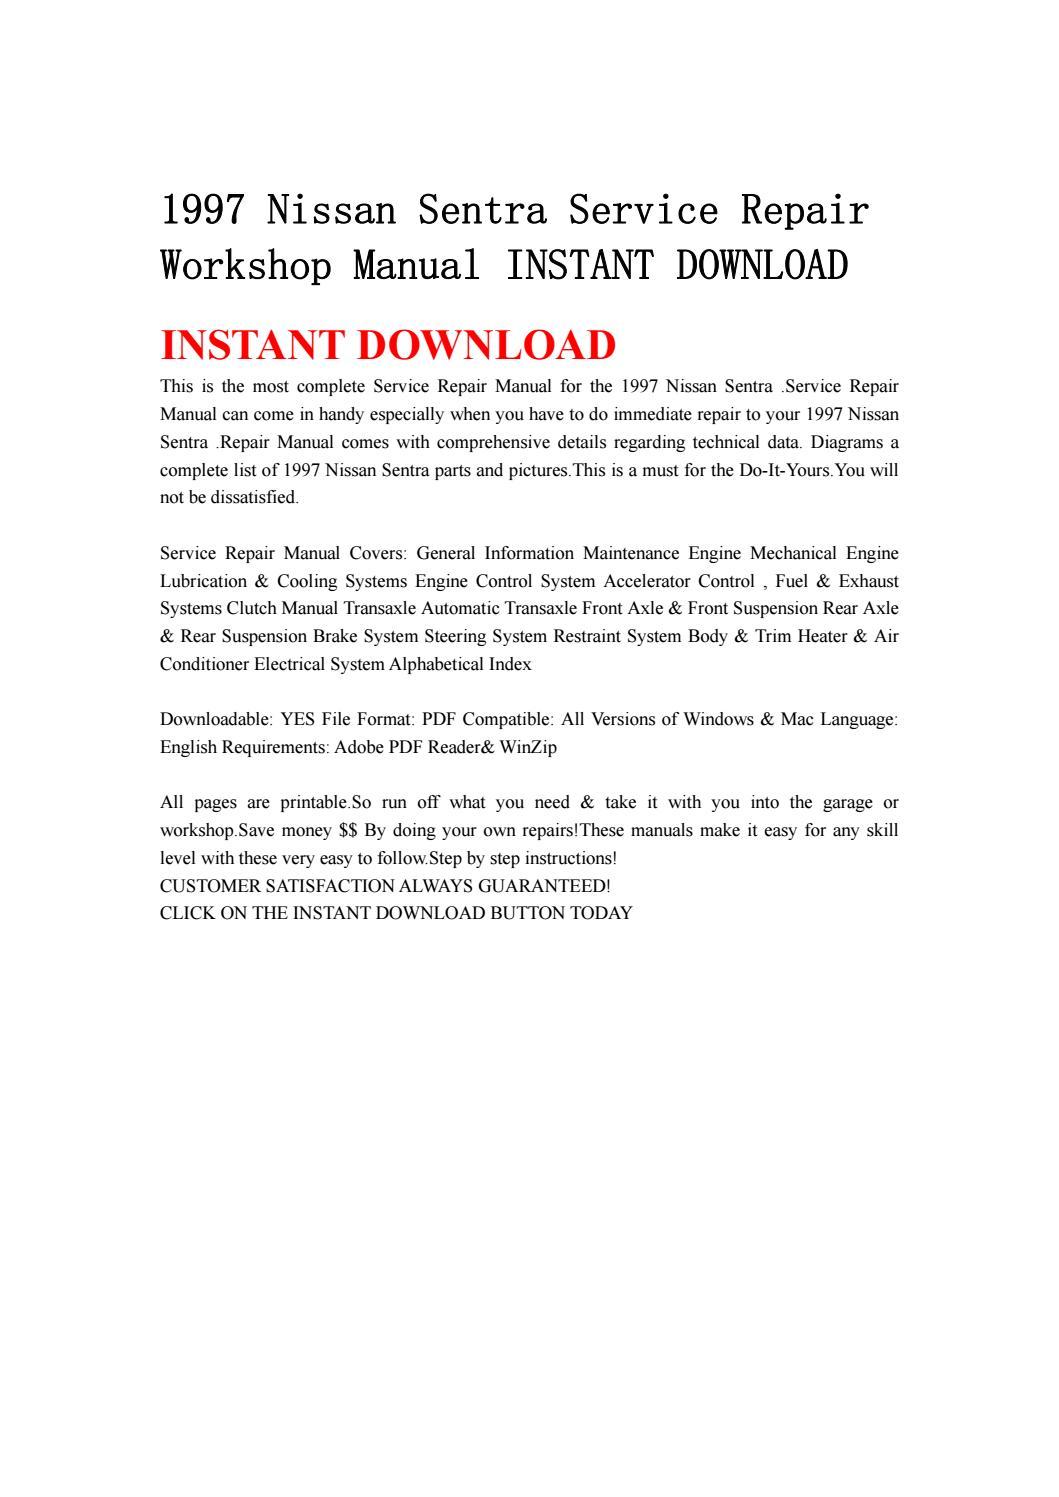 1997 nissan sentra service repair workshop manual instant download 1997 nissan sentra service repair workshop manual instant download by jhsefnshe issuu sciox Gallery